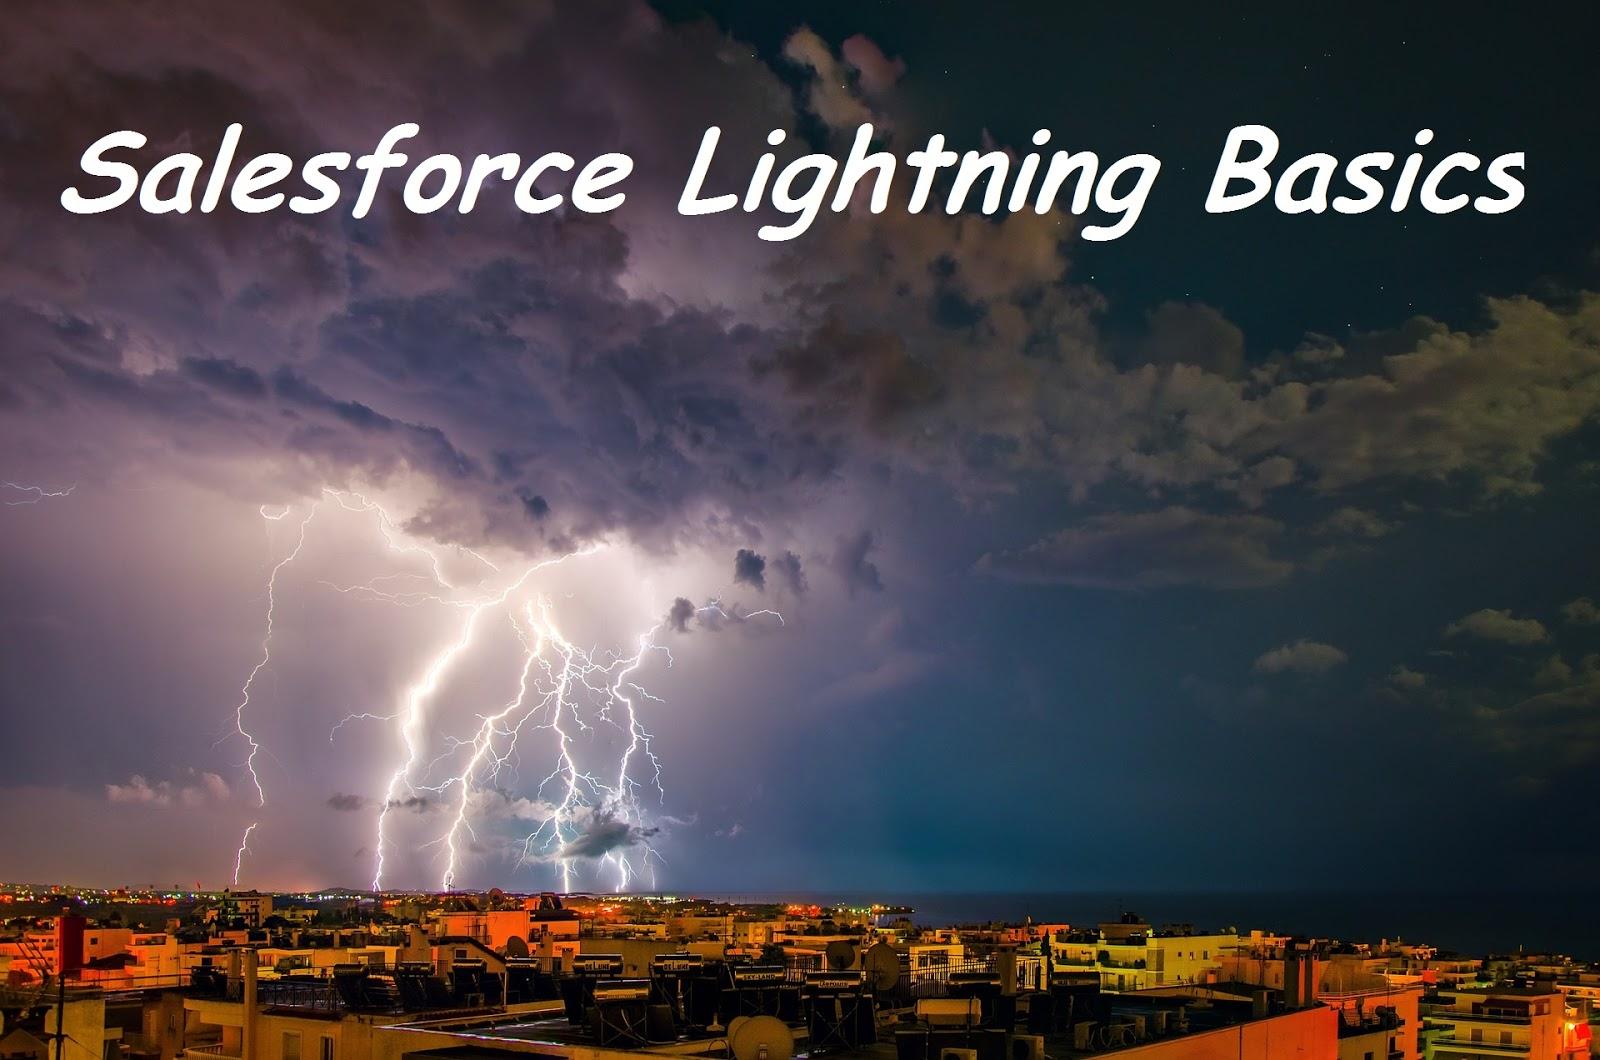 Salesforce Lightning Basics - SFDC Stop